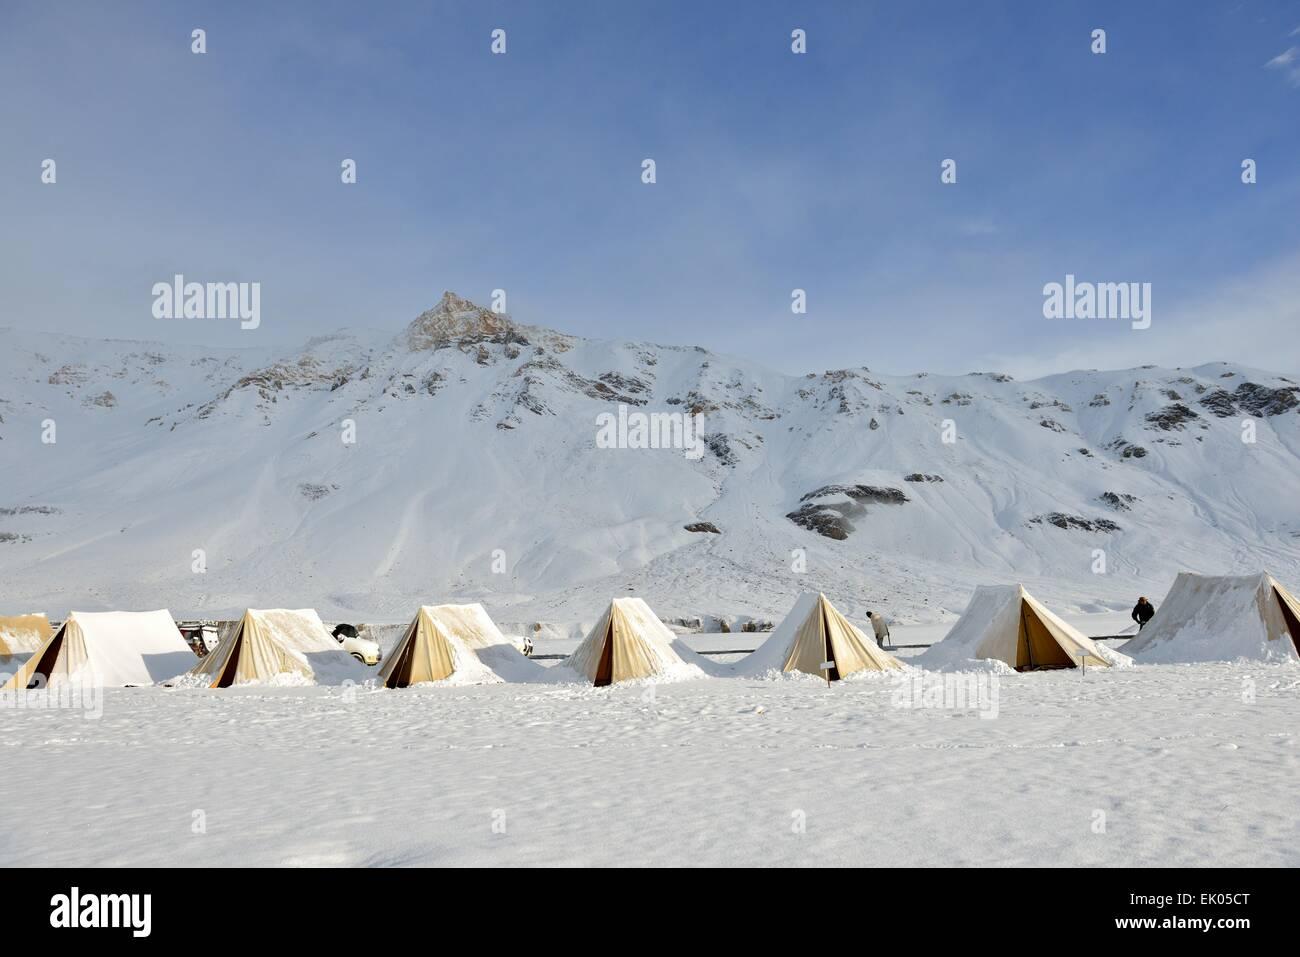 Snowy tents in Ladakh India & Snowy tents in Ladakh India Stock Photo: 80524216 - Alamy